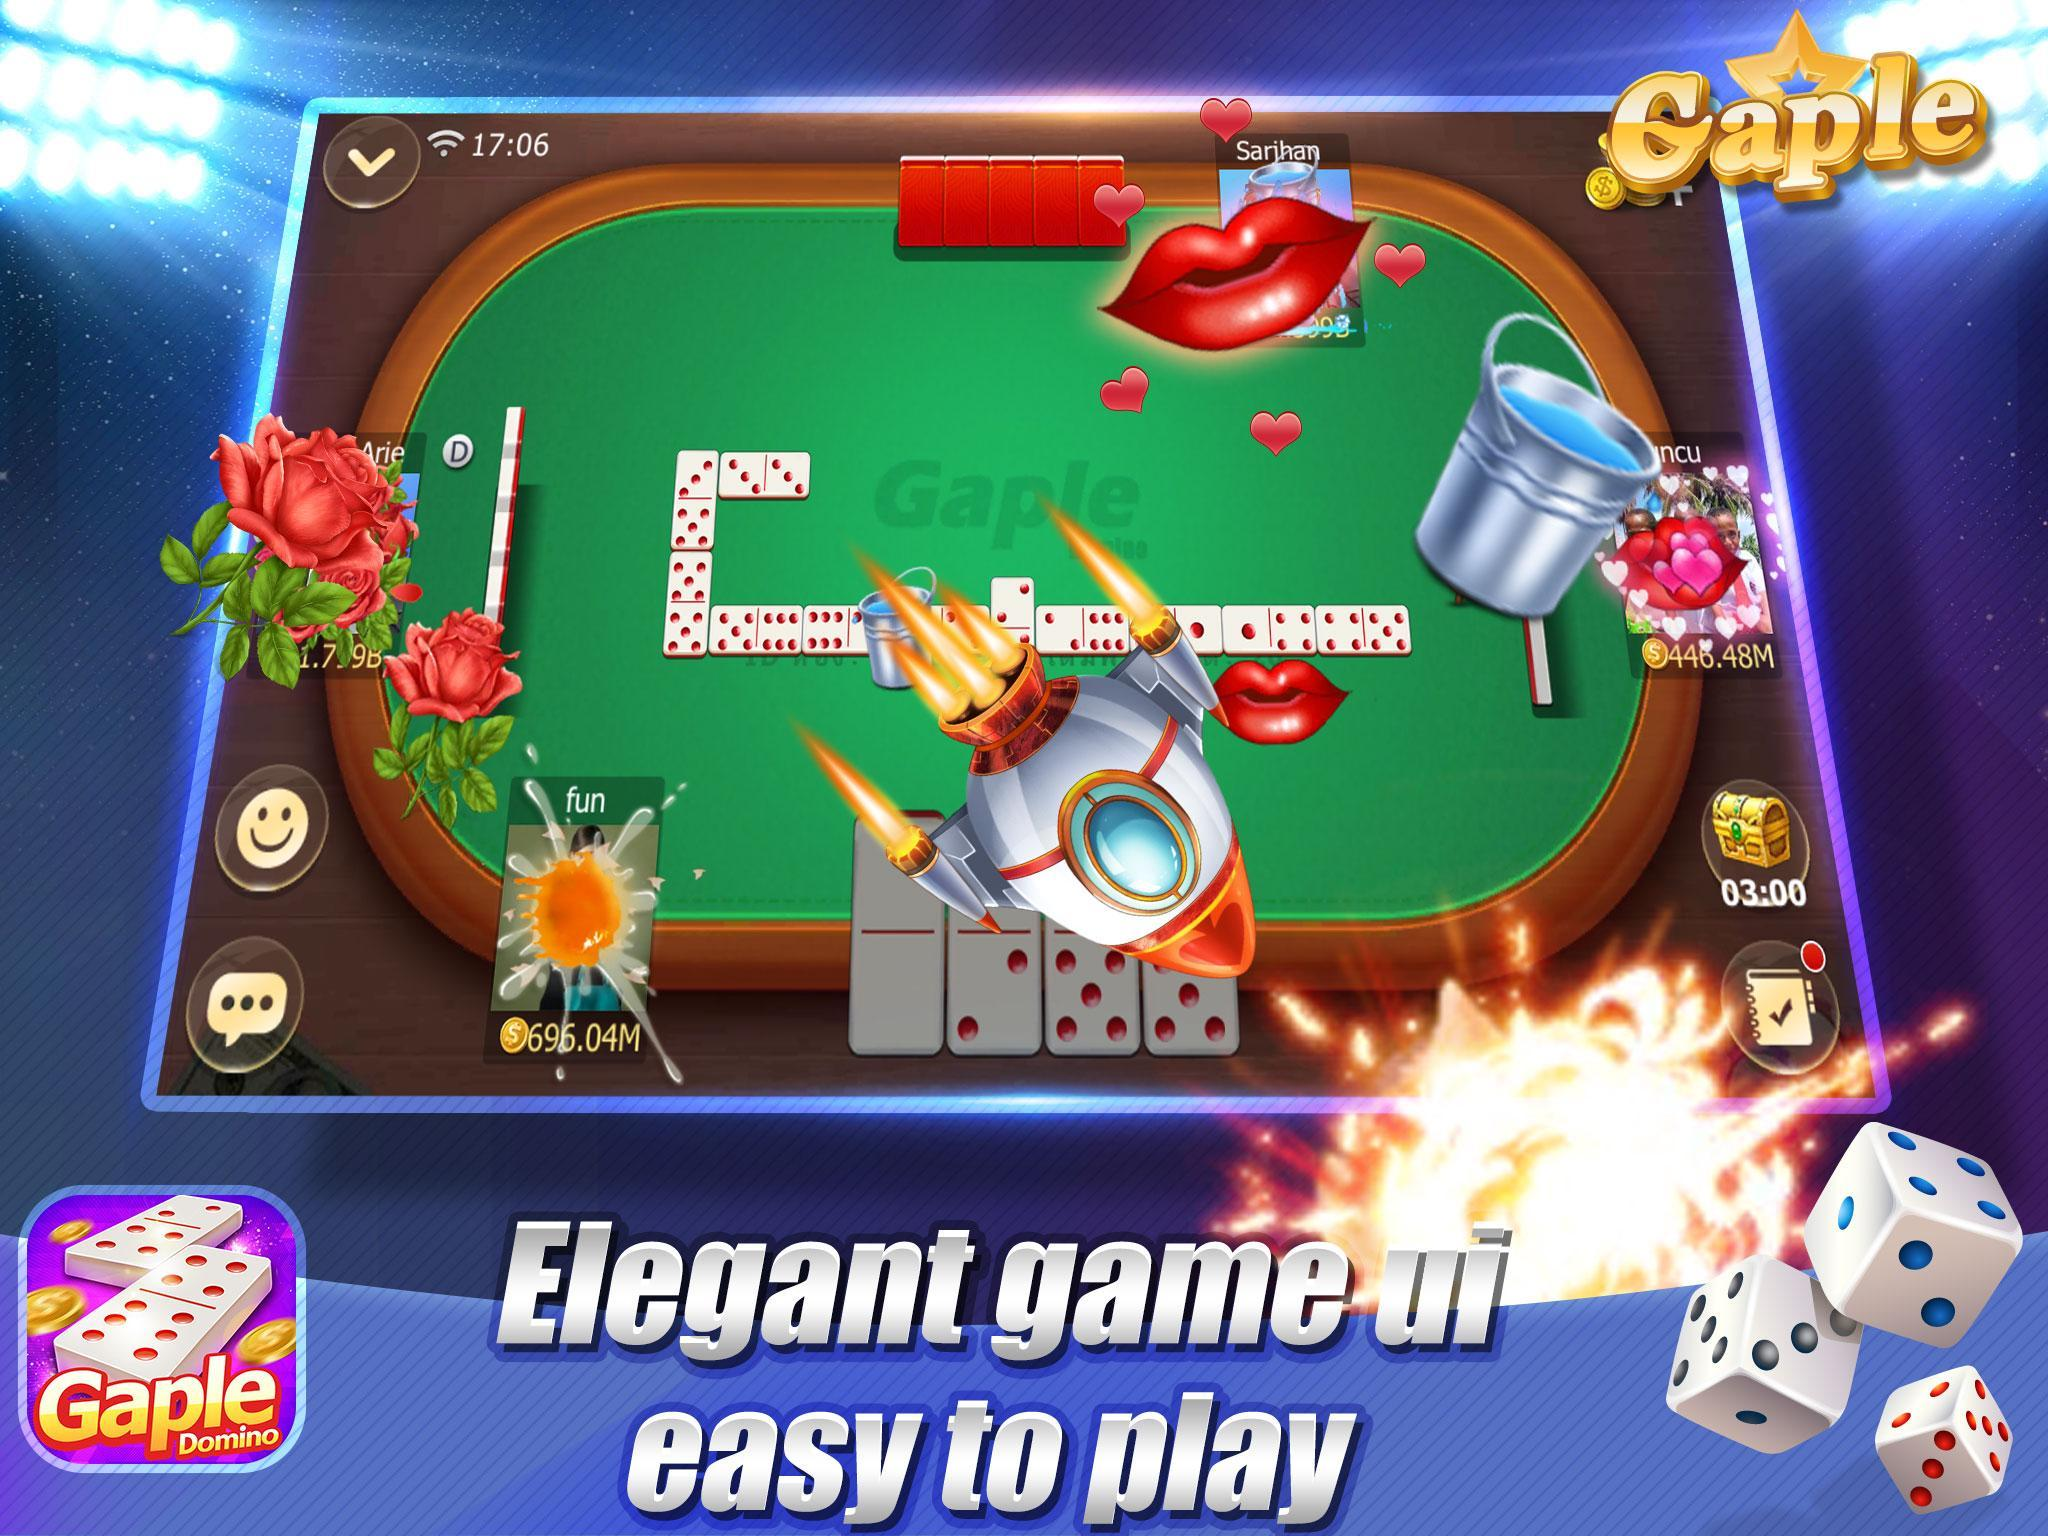 Domino Gaple Online Qiuqiu 99 For Android Apk Download